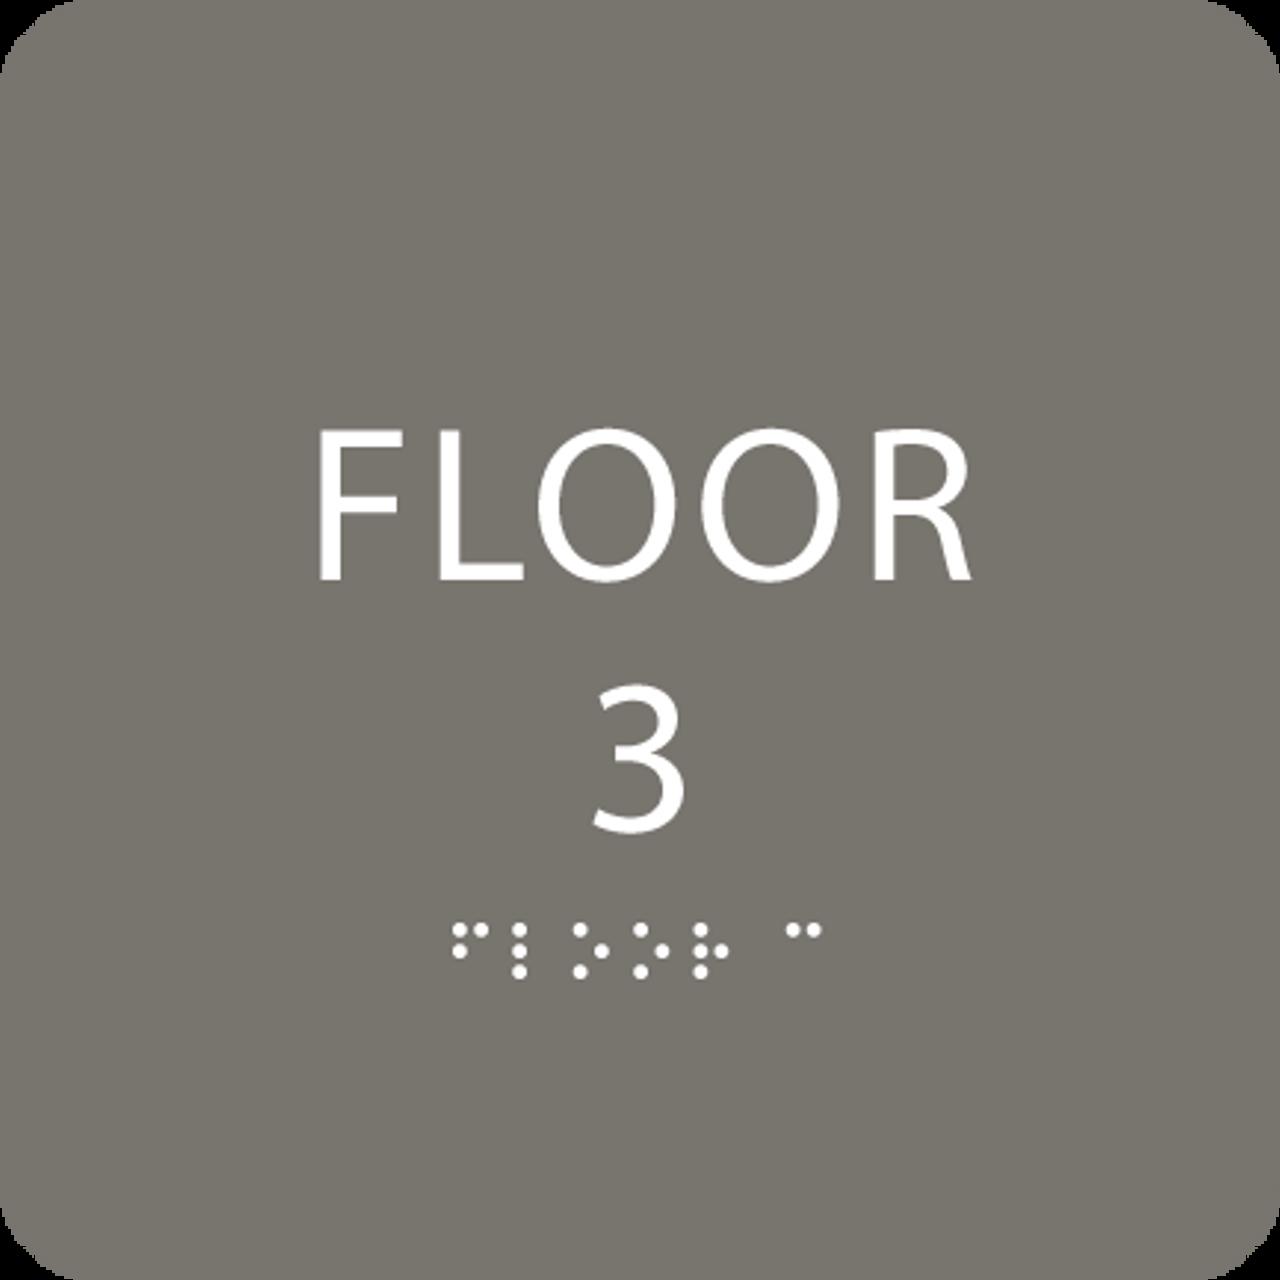 Dark Grey Floor 3 Identification Sign